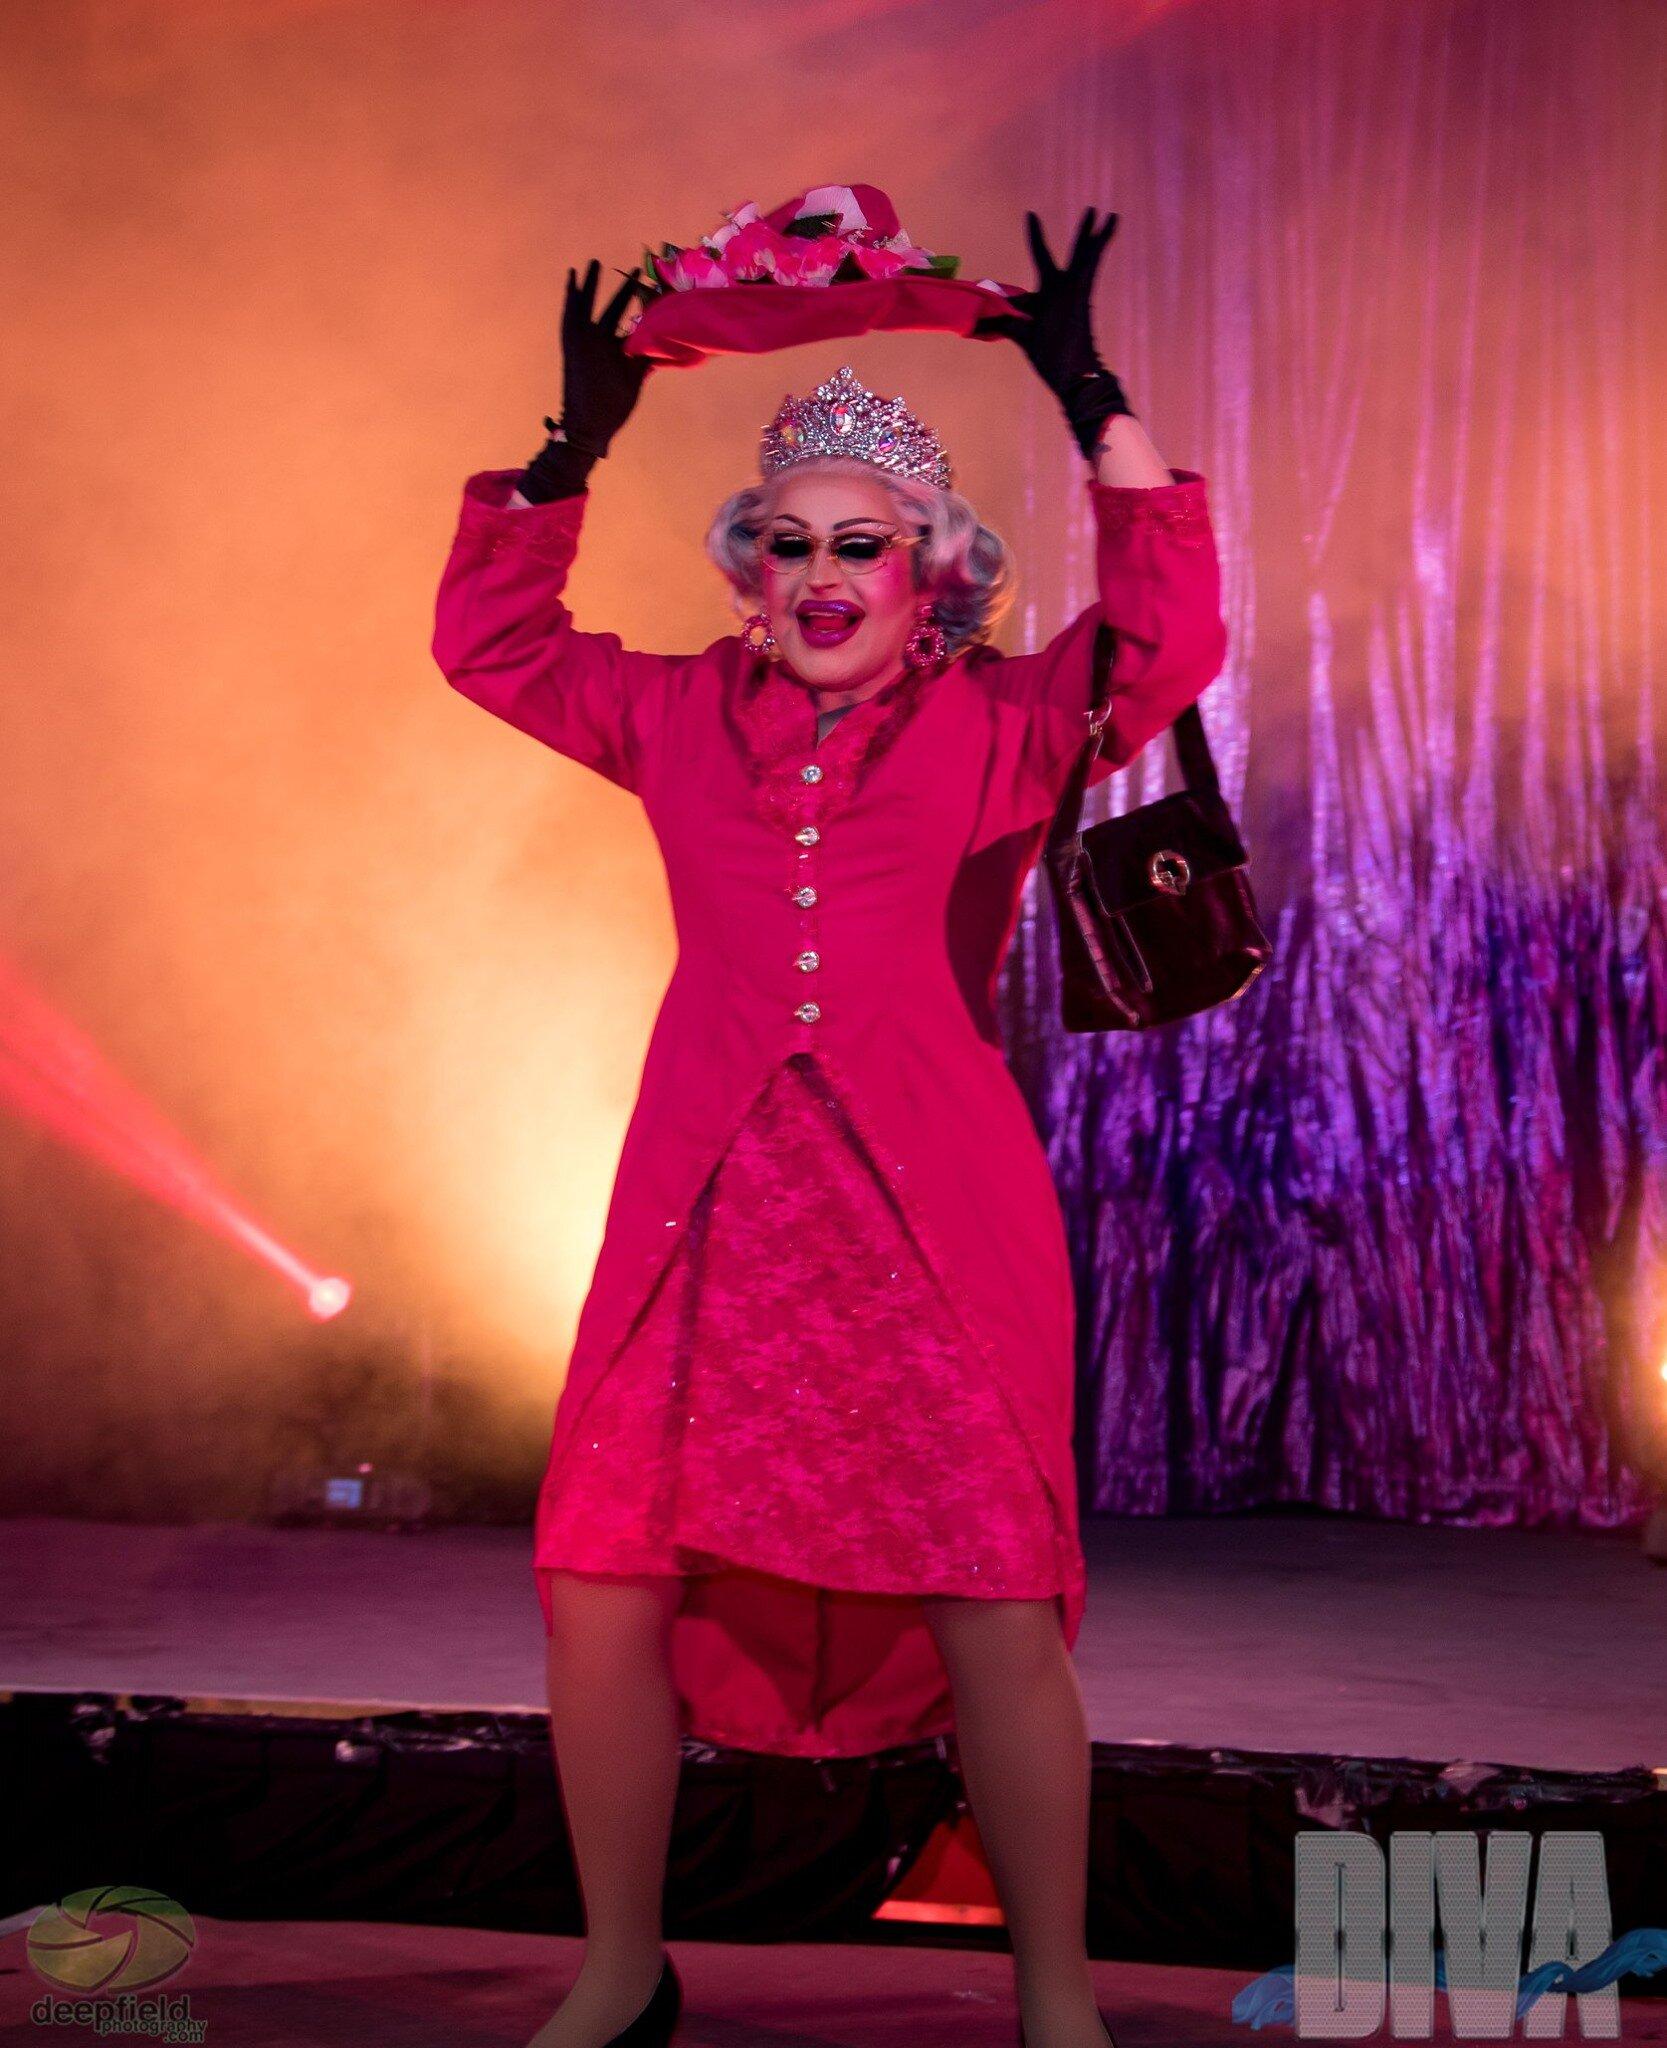 hannah-conda--queen-elizabeth-second-uk-diva-awards-sydney-drag-queen-royalty-best-hire-drag-race-australia-3.jpg